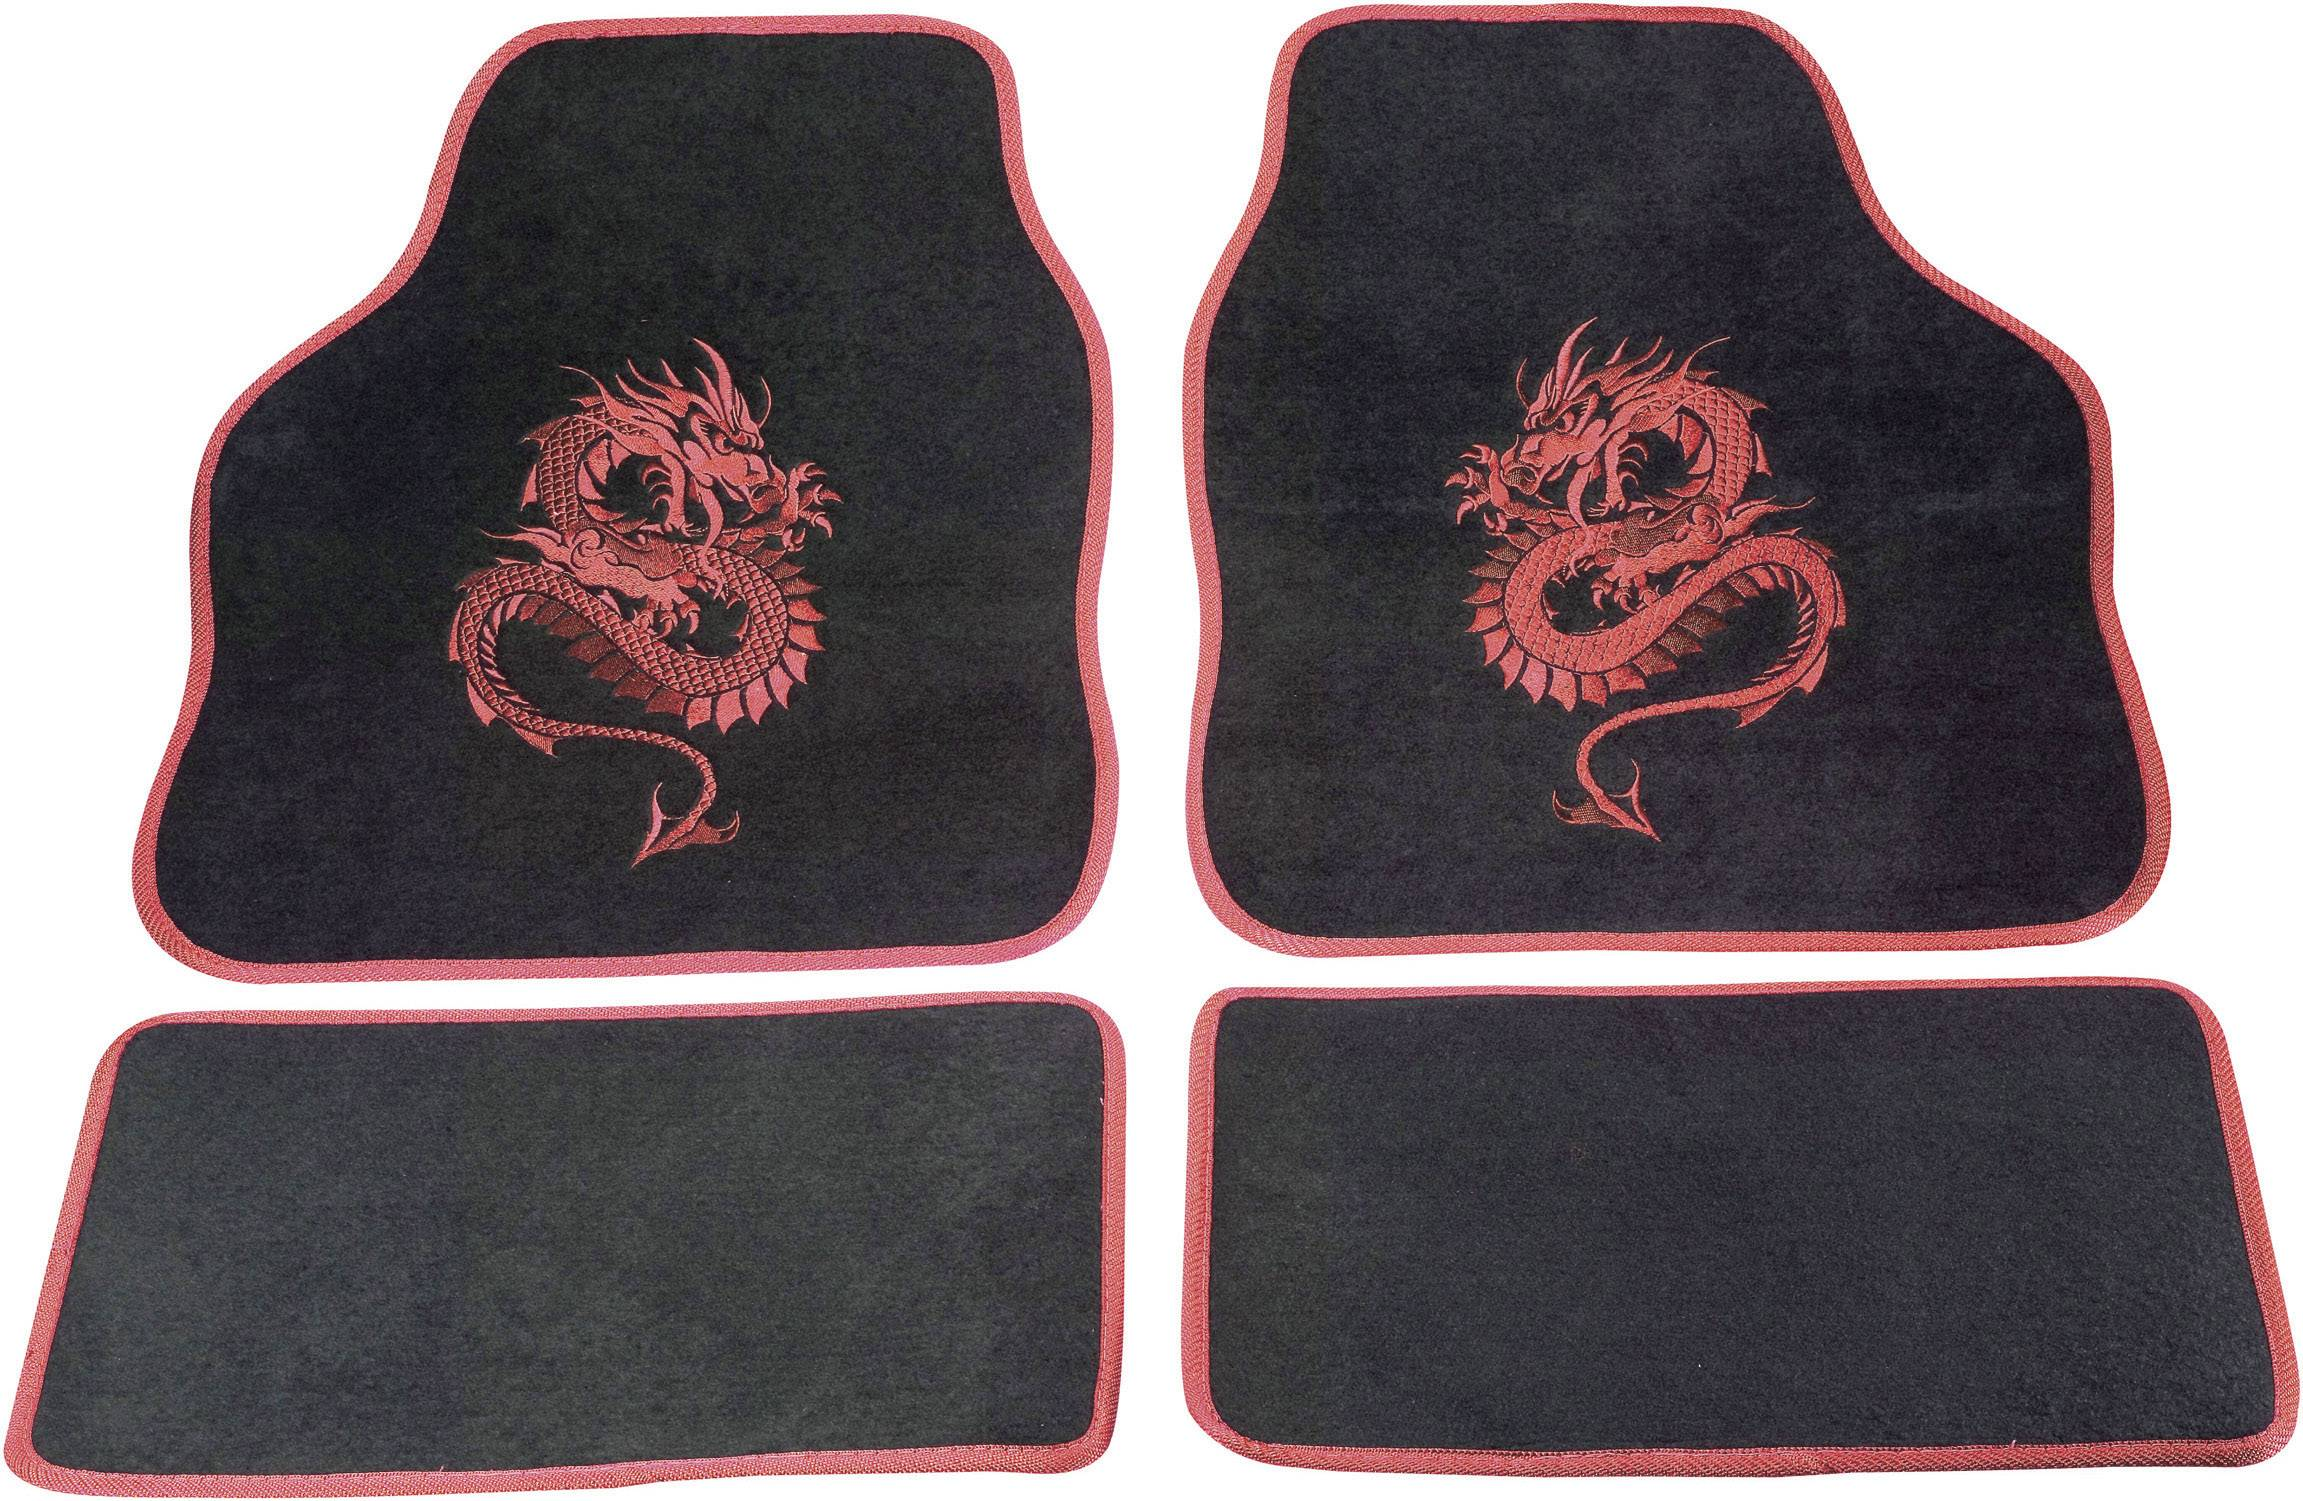 Rohožka (univerzálna) do auta cartrend 1400-02 1400-02, textil, červená